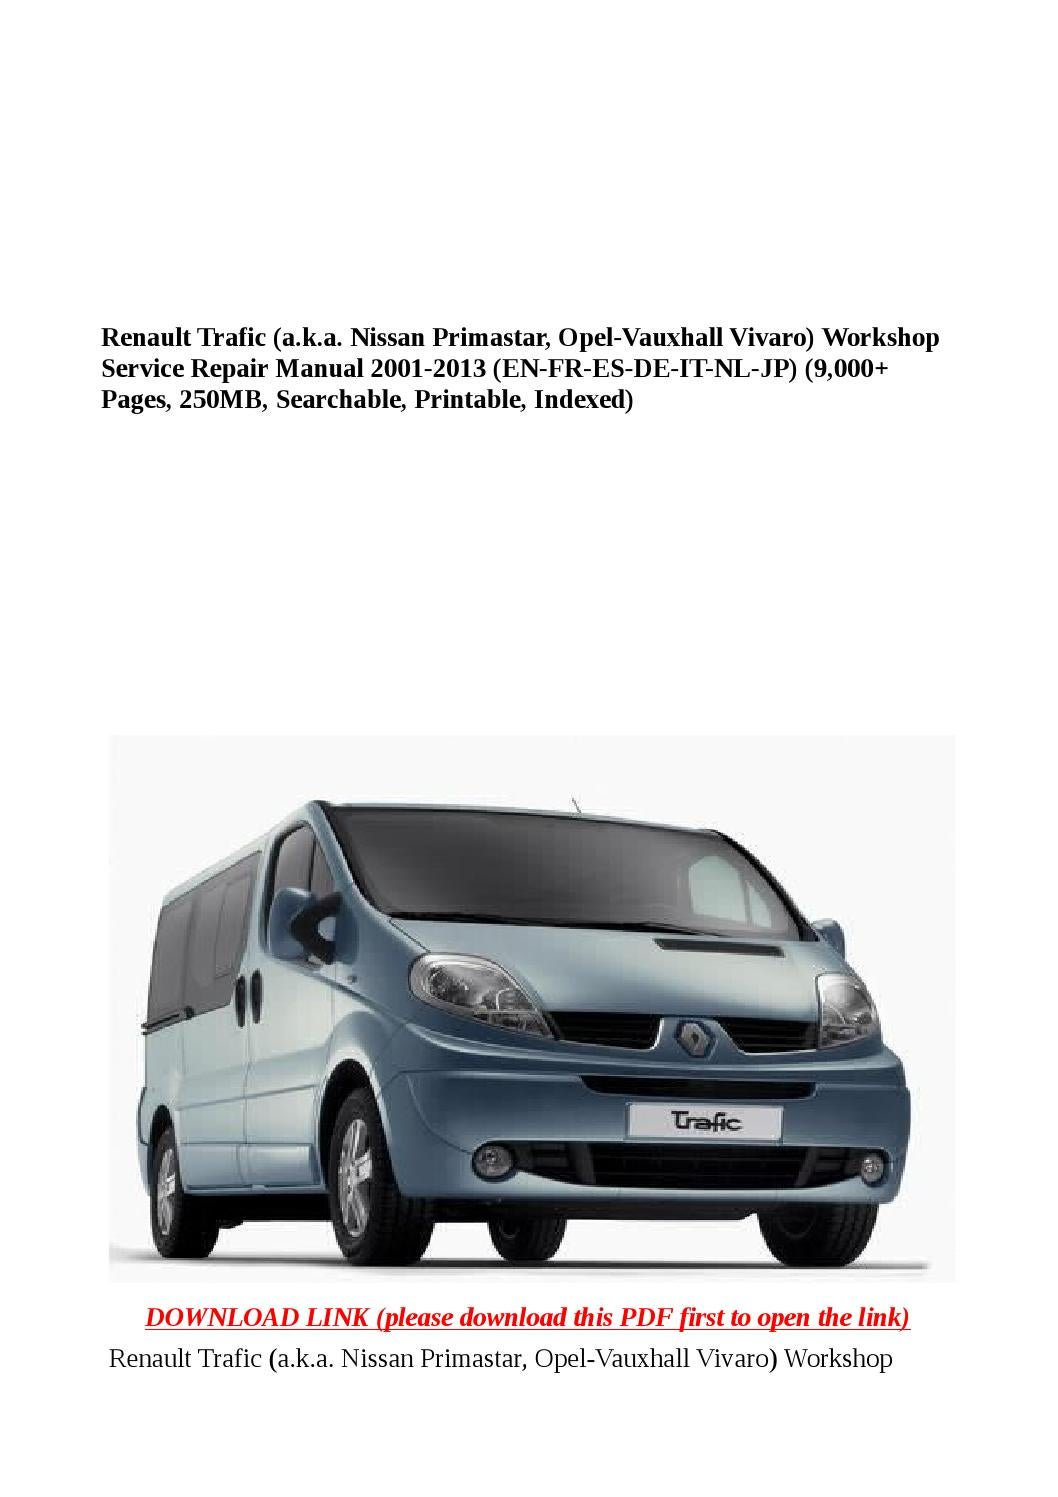 Renault trafic (a k a nissan primastar, opel vauxhall vivaro) workshop  service repair manual 2001 20 by buhbu - issuu